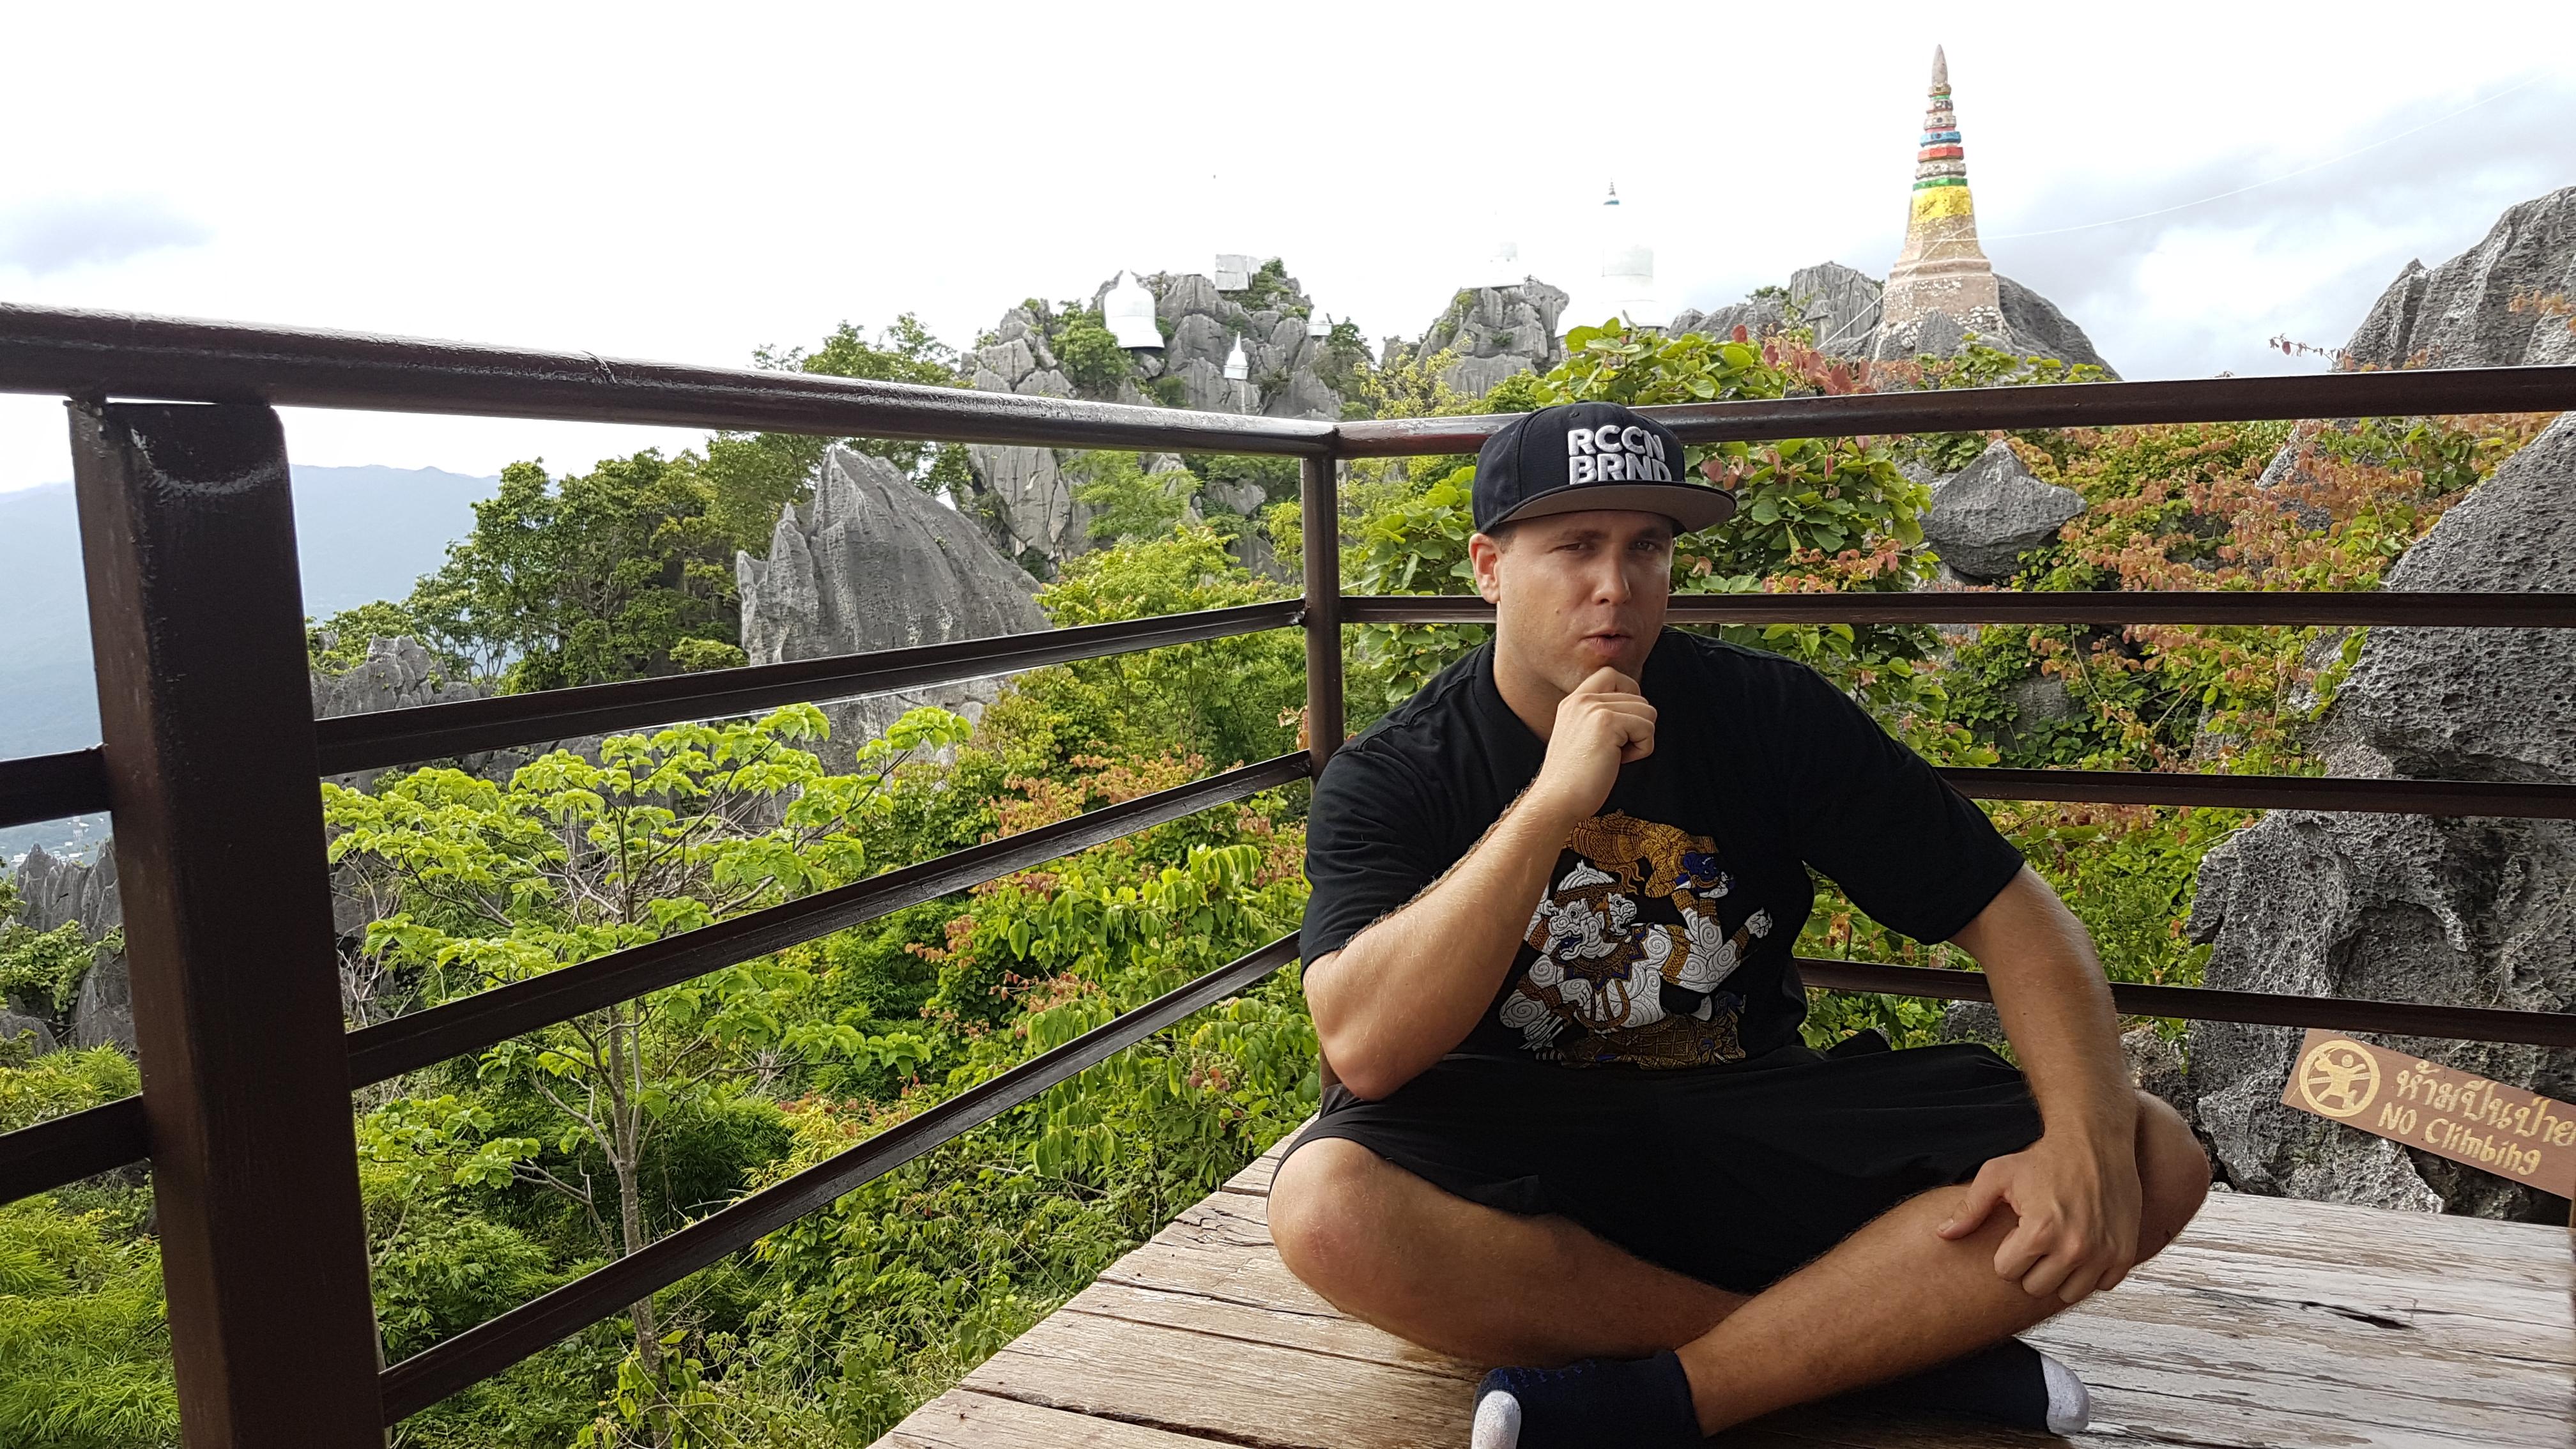 Wat Chaloem Phra Kiat Phrachomklao Rachanusorn